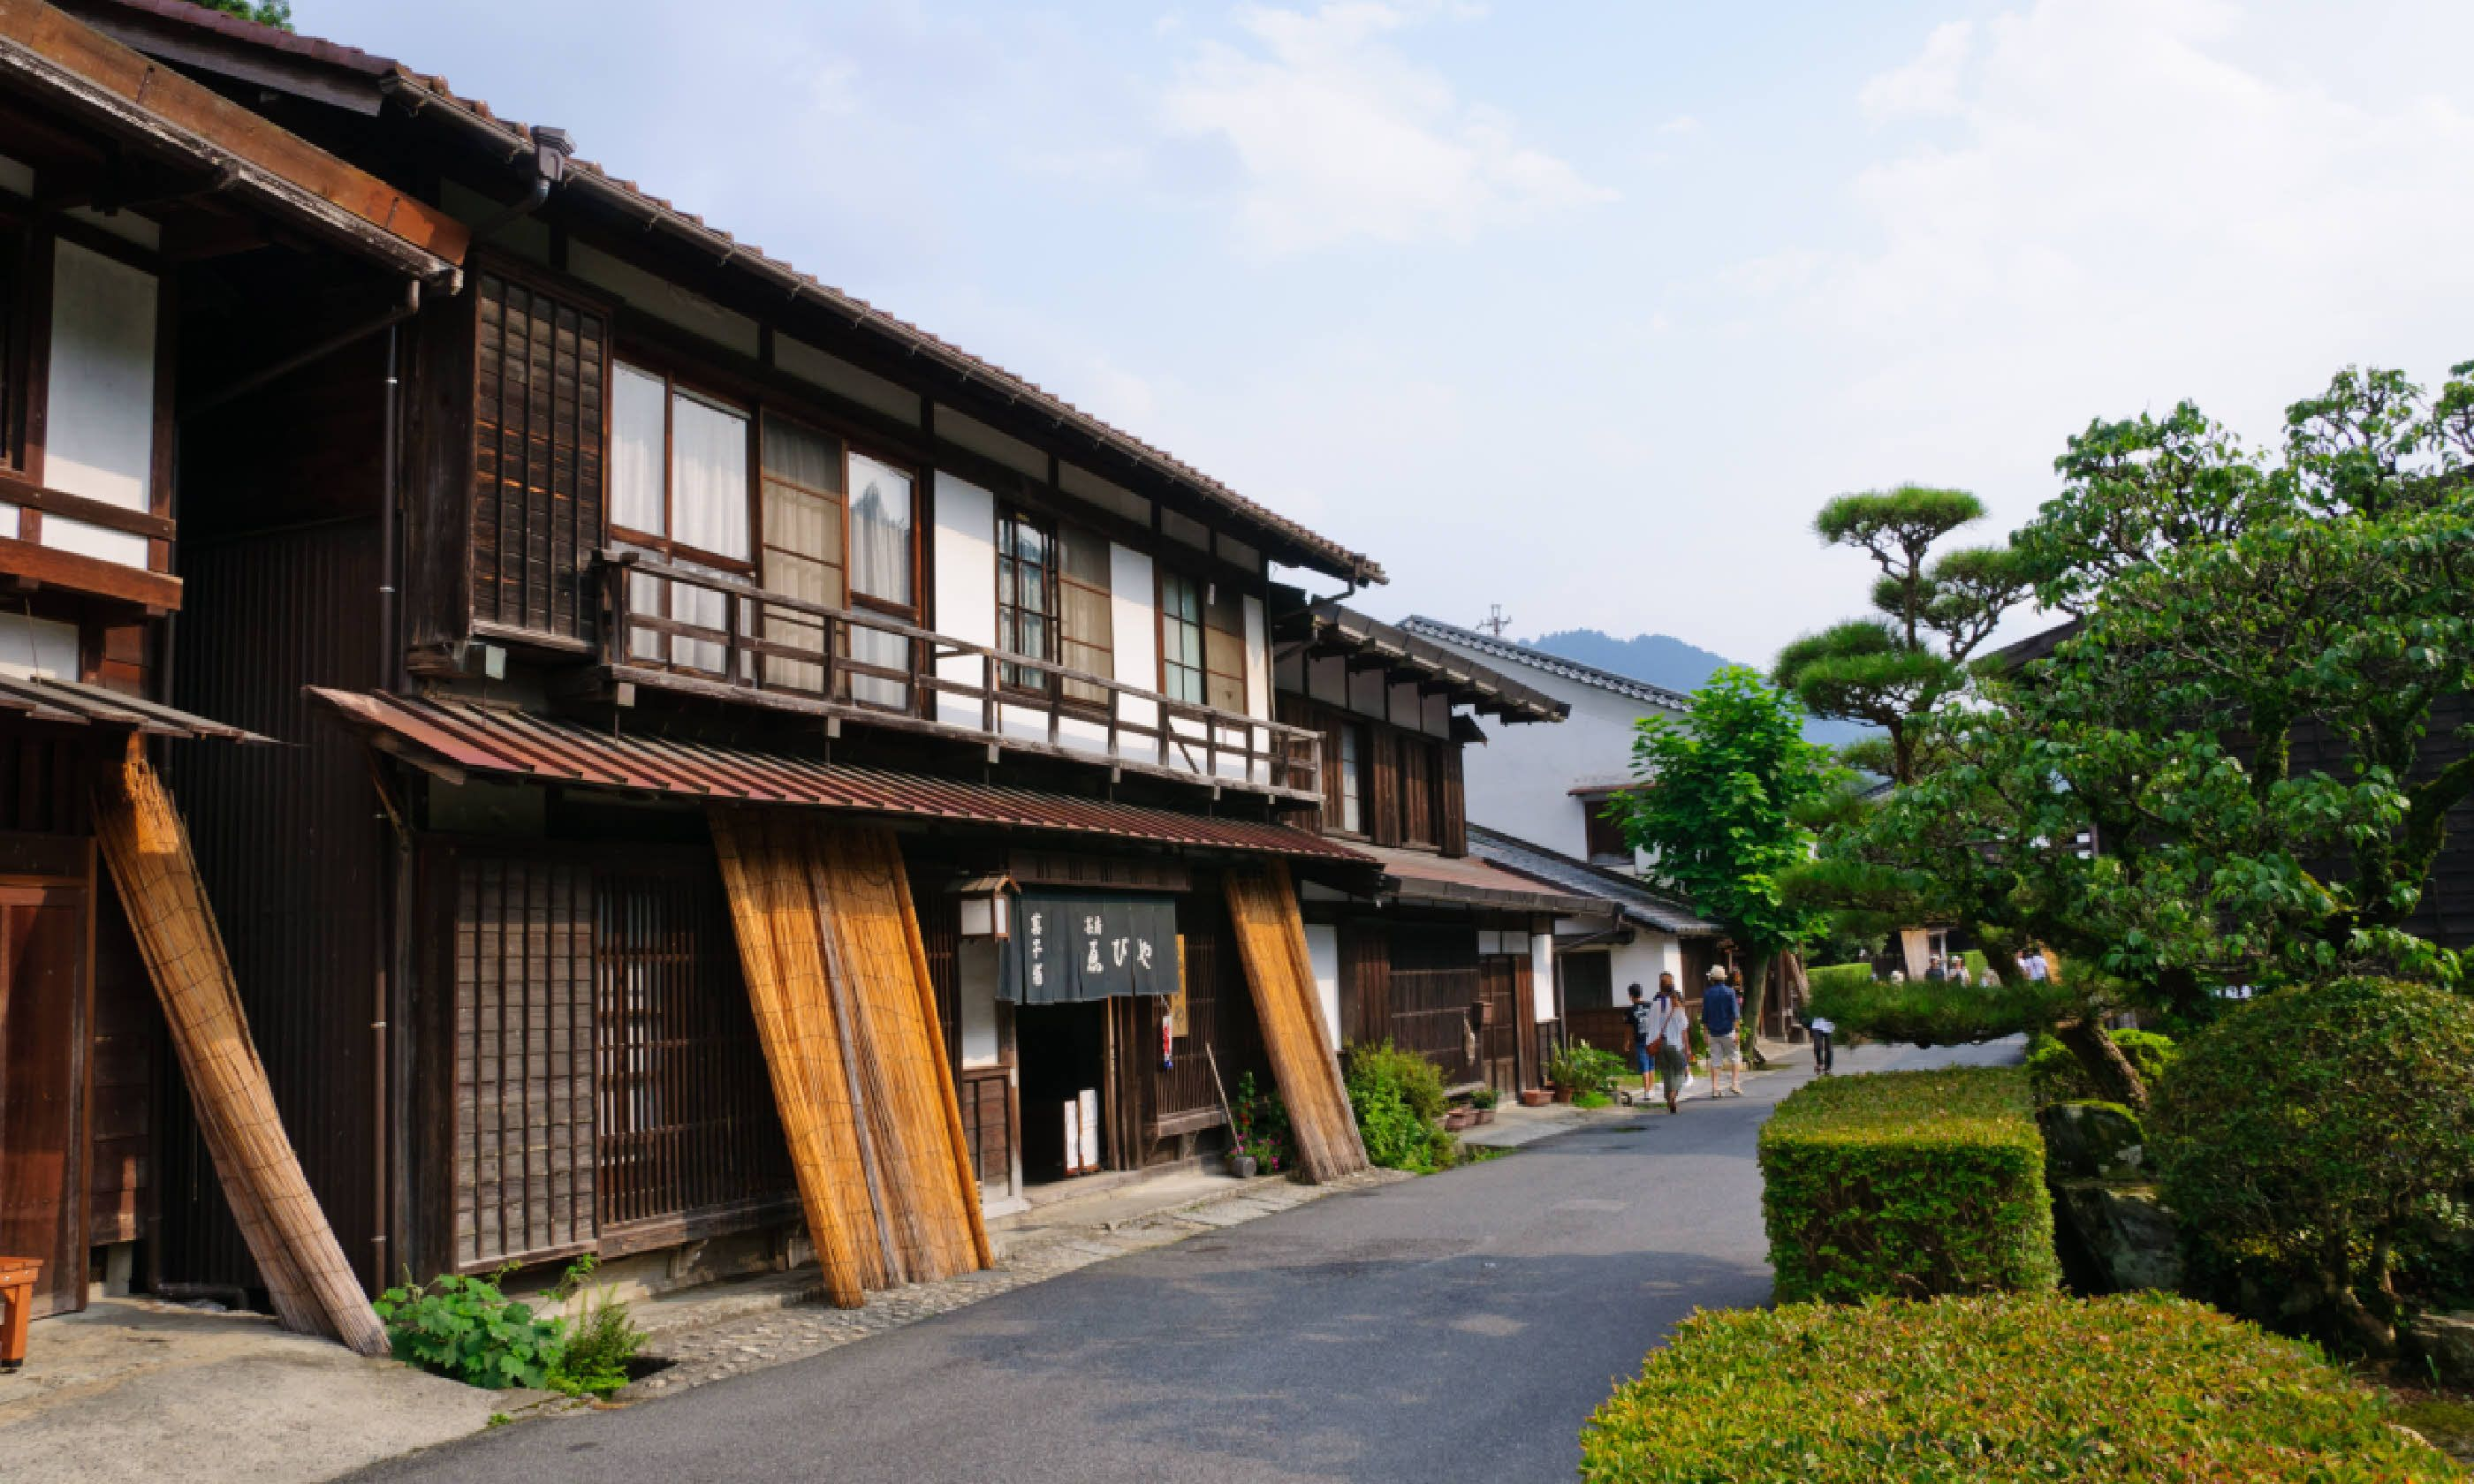 Tsumago-juku (Shutterstock)